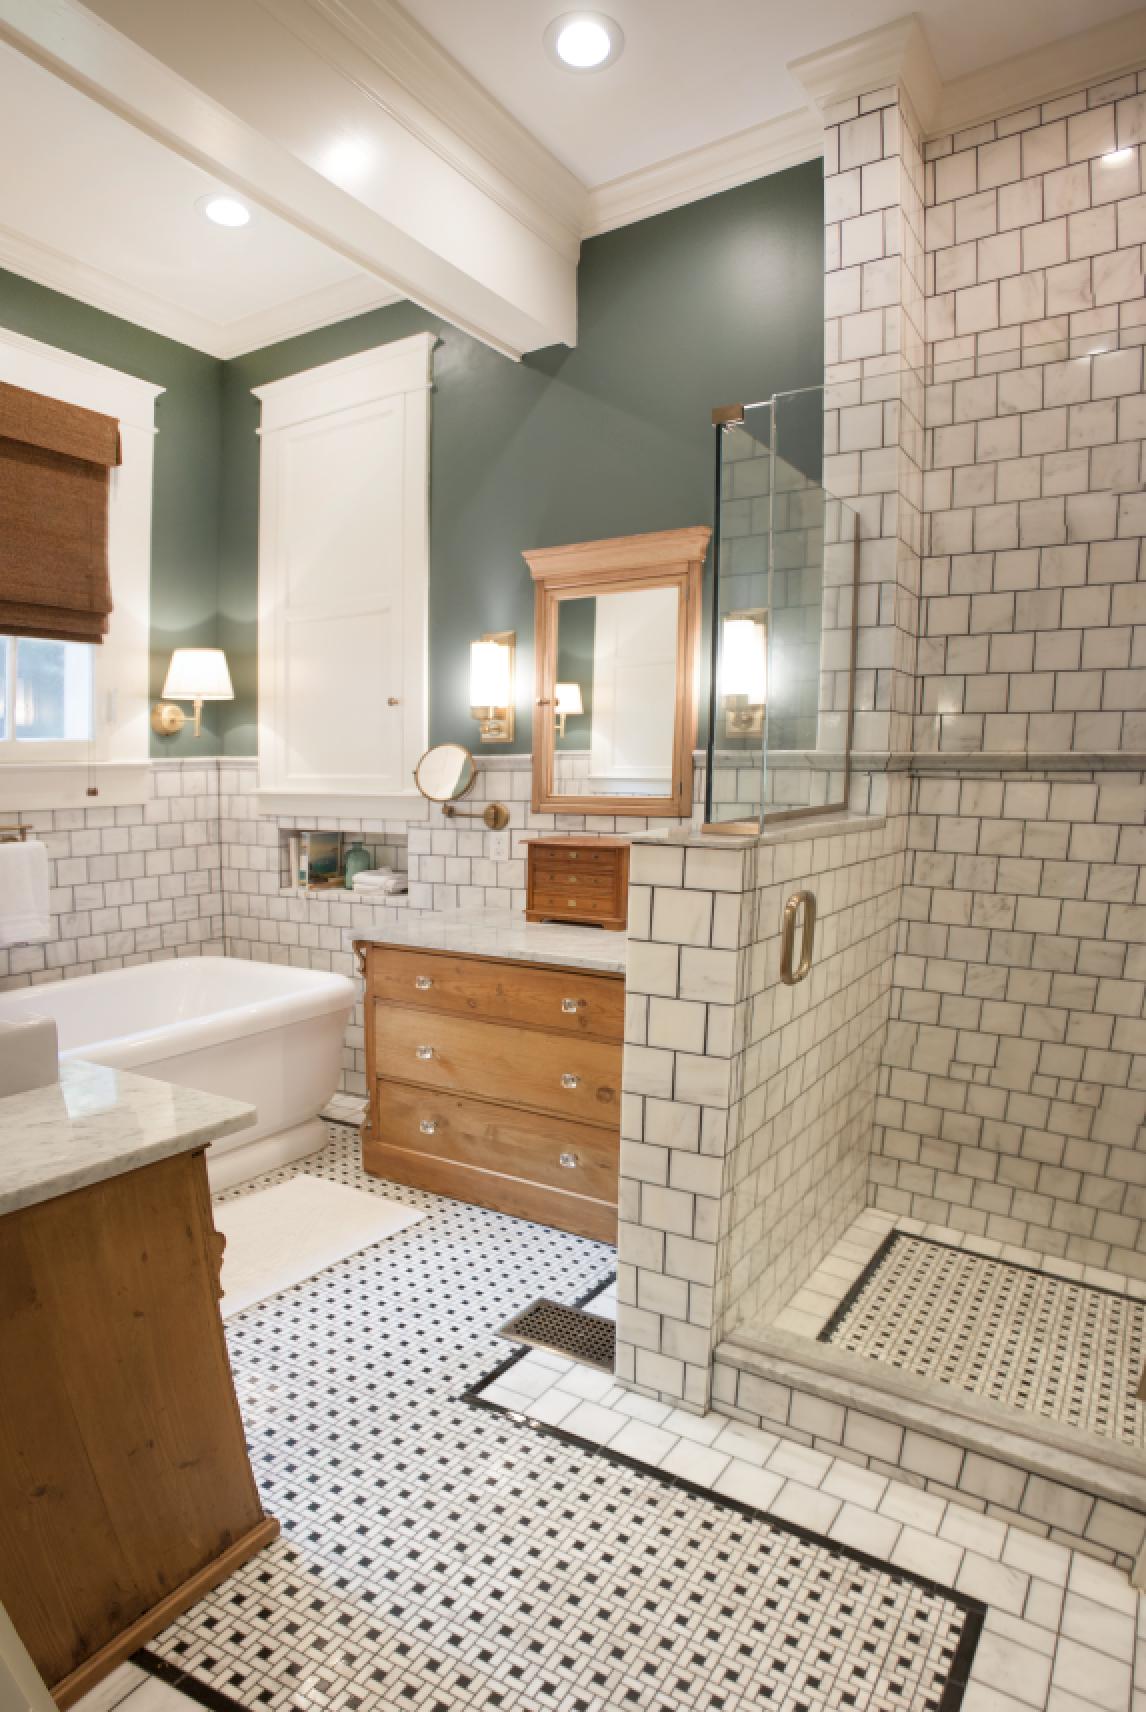 12 ideas for designing an art deco bathroom master on bathroom renovation ideas id=42509